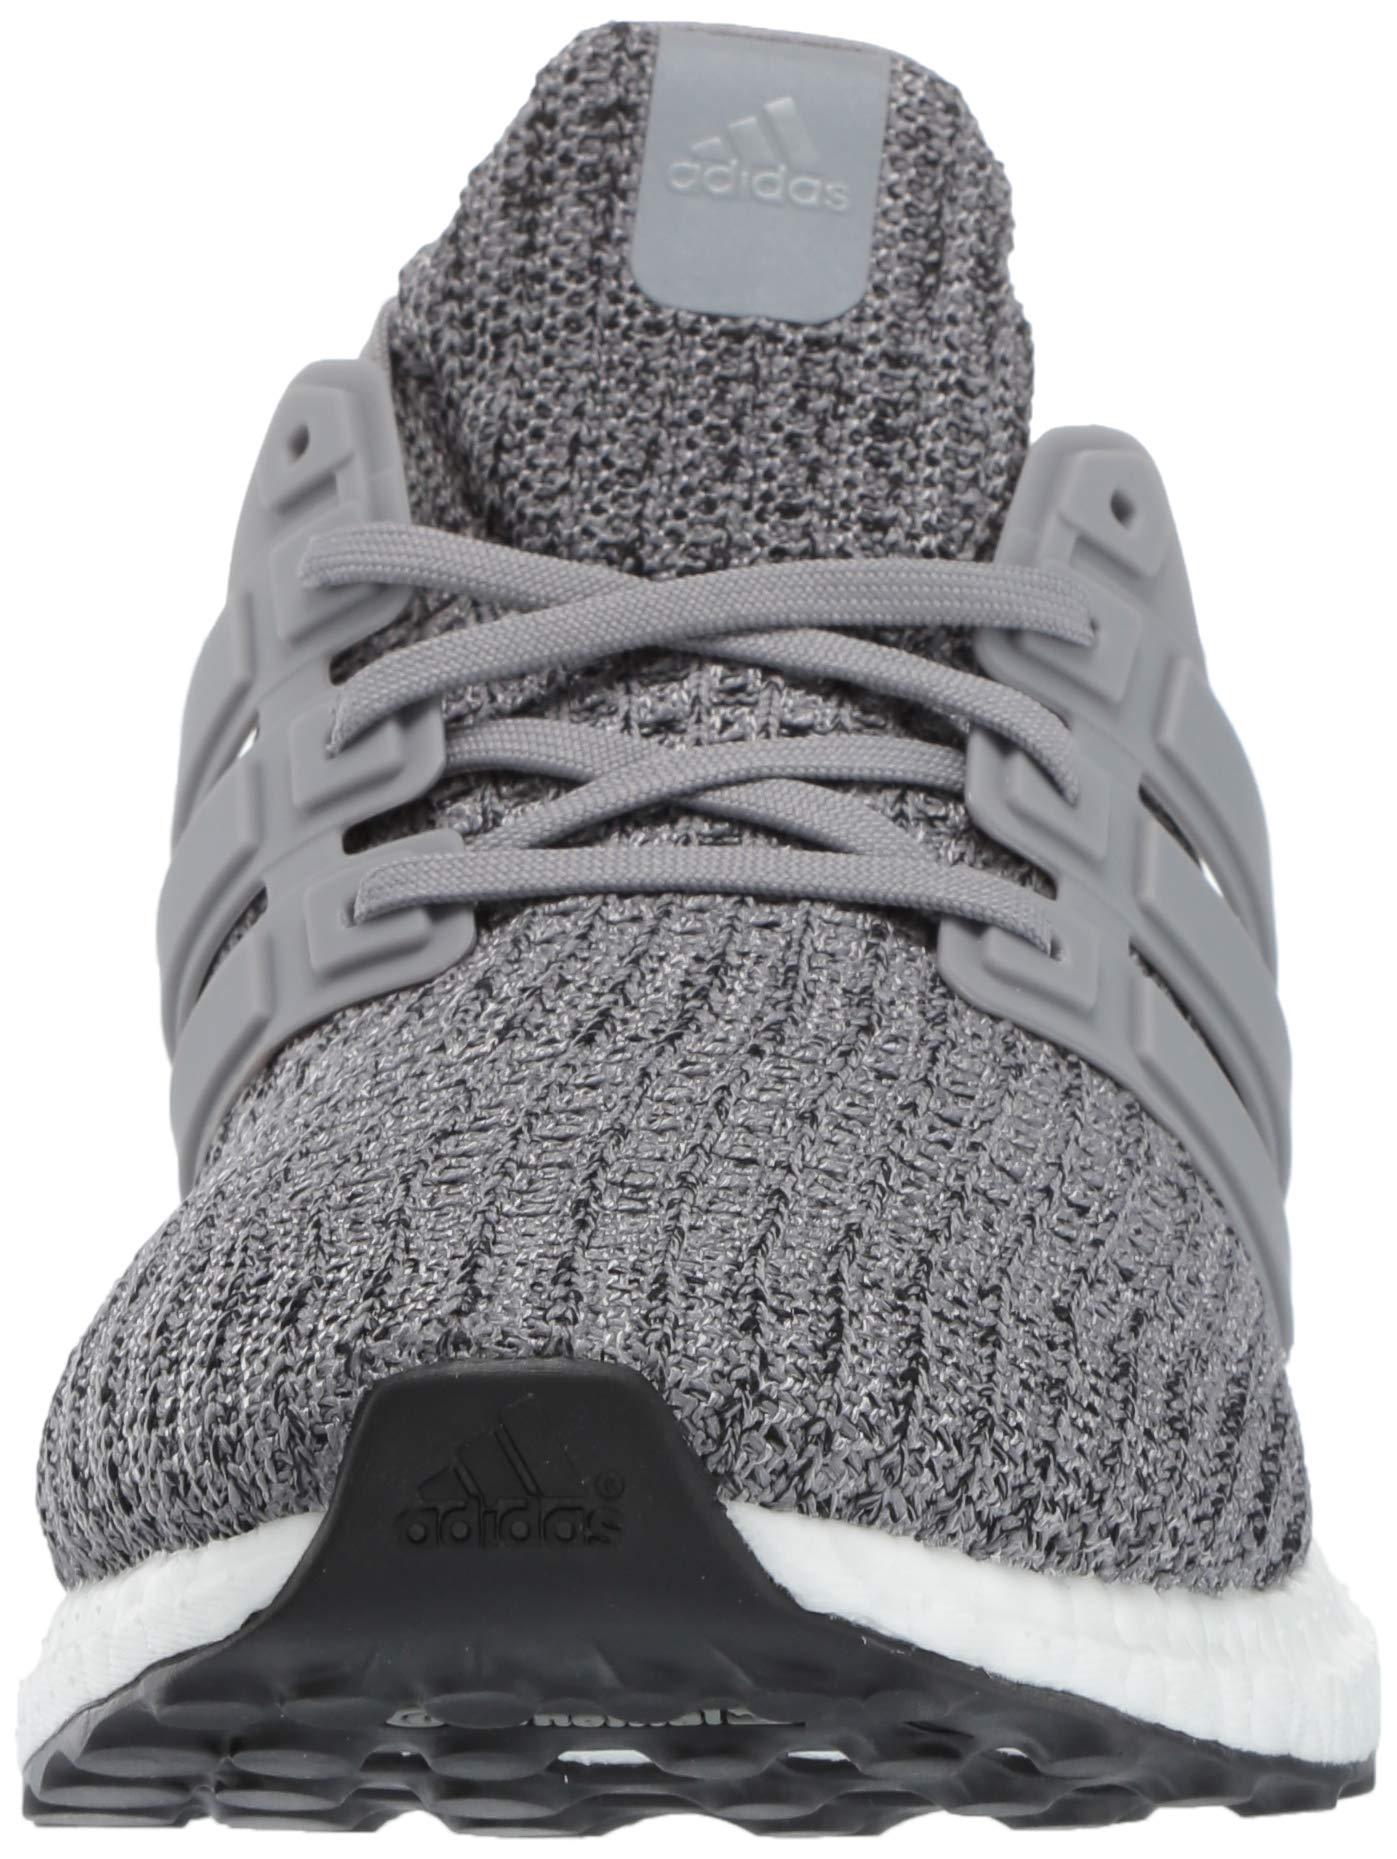 adidas Men's Ultraboost, Grey/Black, 4 M US by adidas (Image #4)